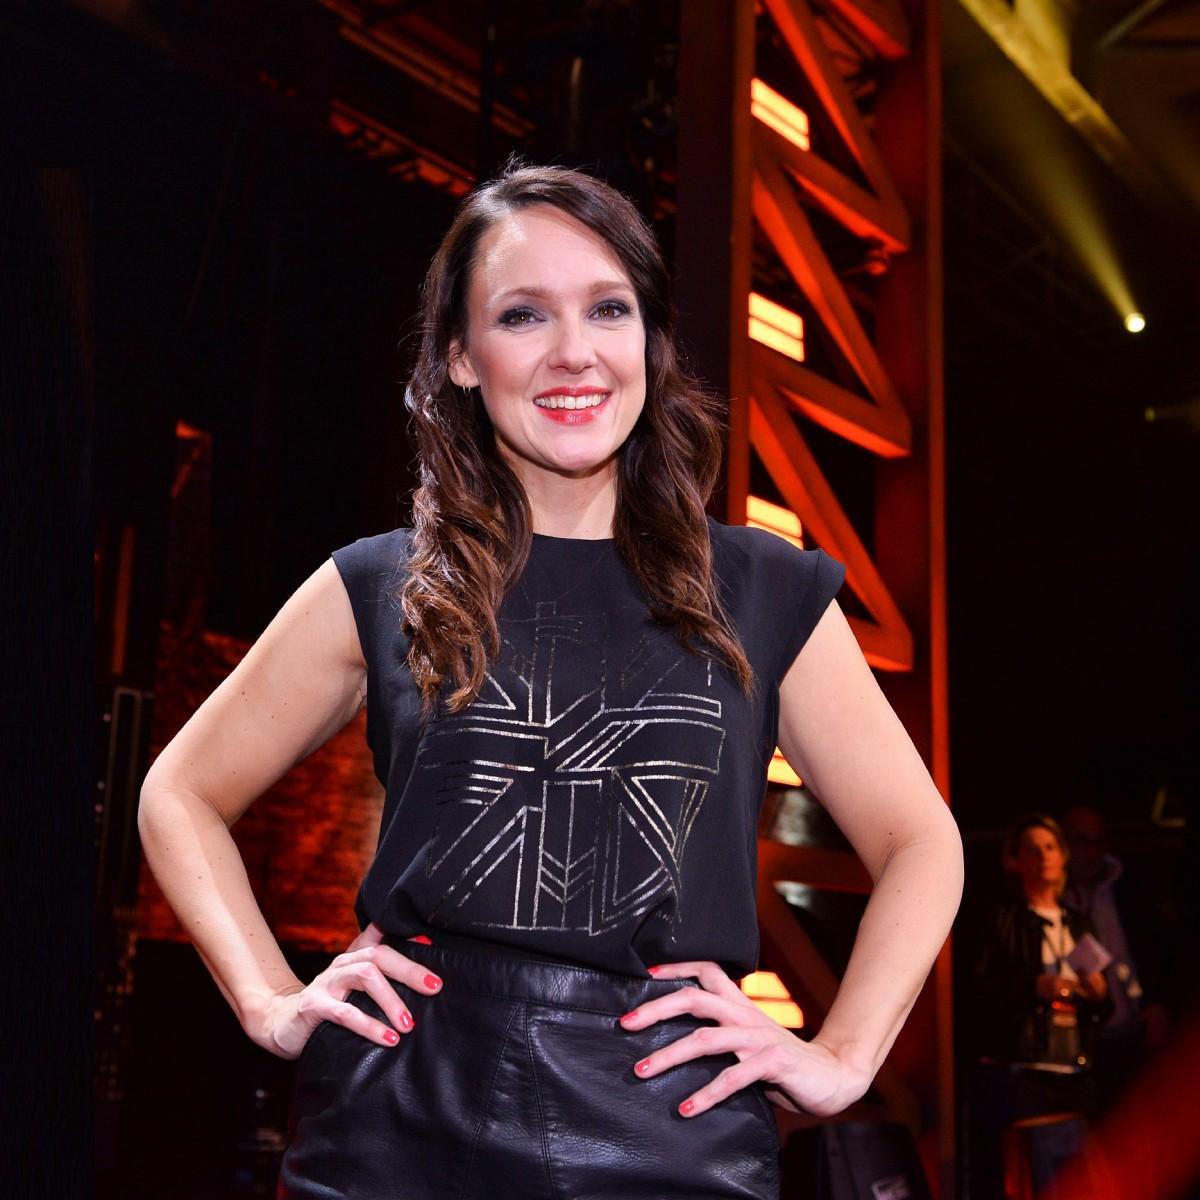 Carolin Kebekus kehrt als Comedypreis-Gastgeberin zurück